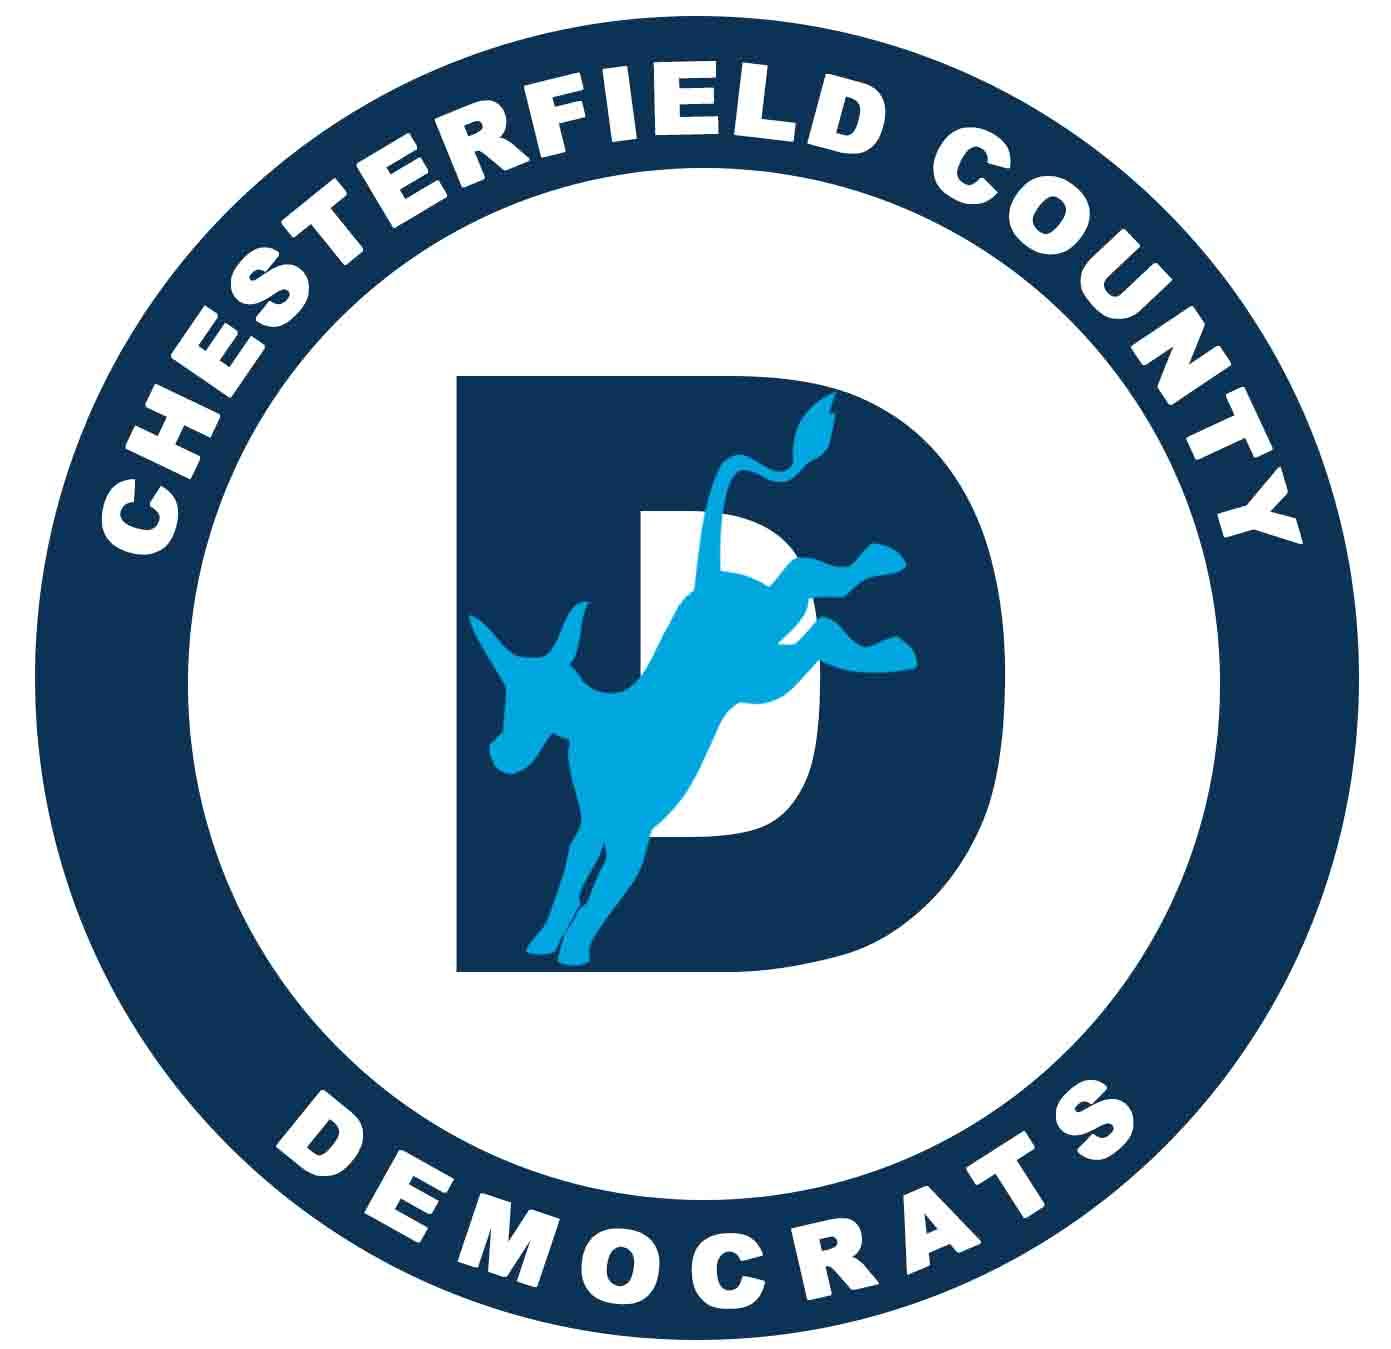 Chesterfield County Democratic Committee (VA)